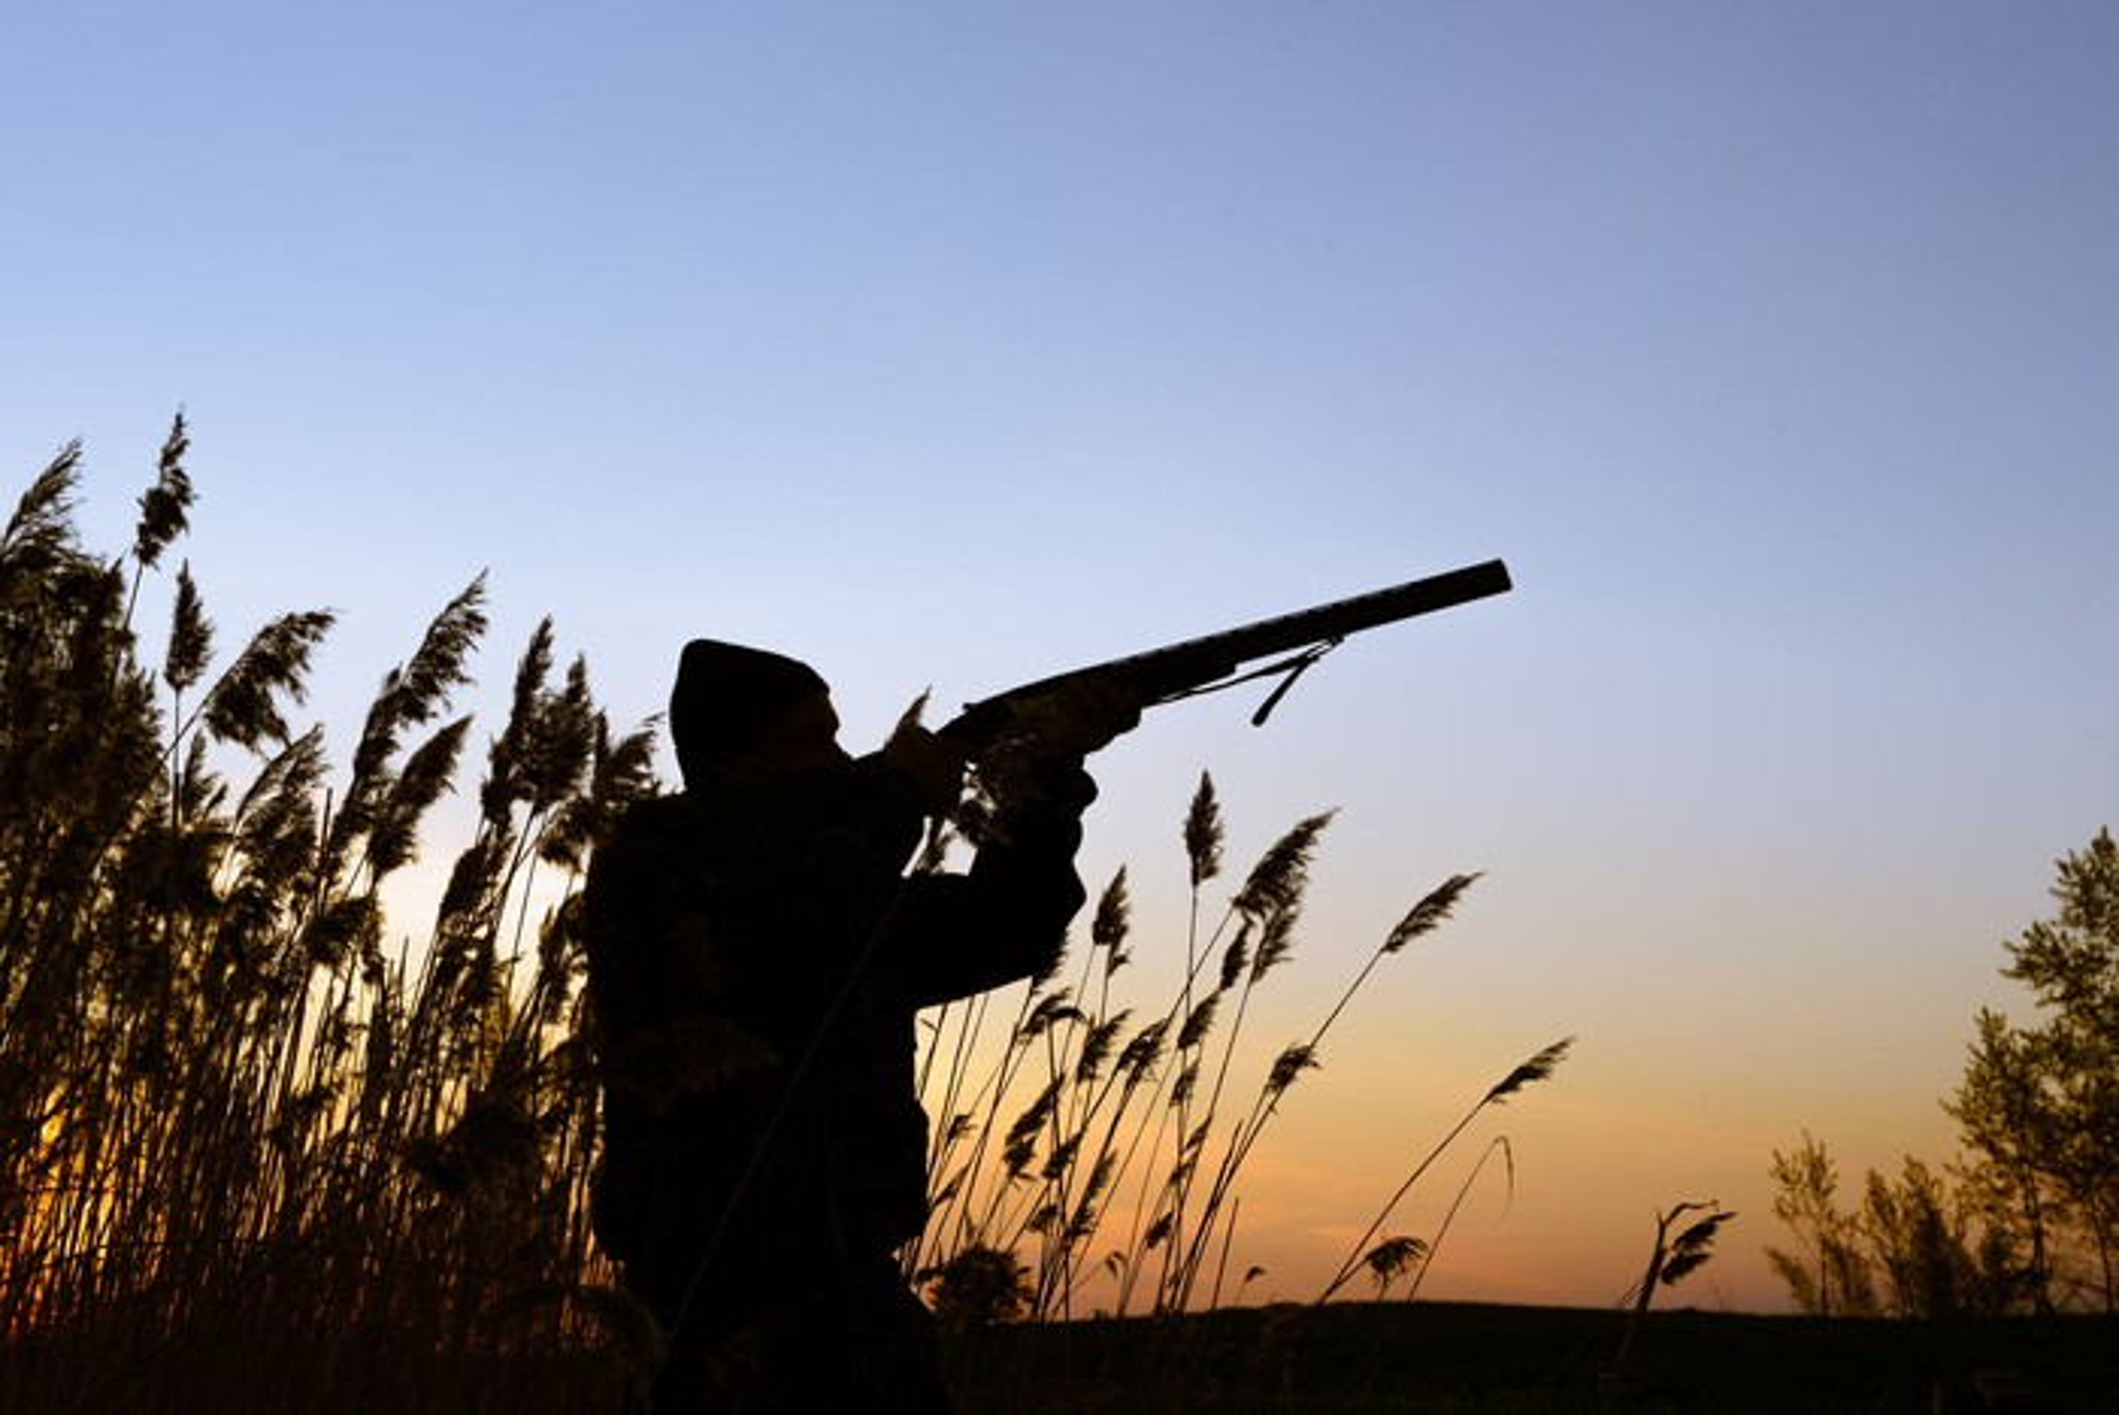 Hunter shooting at prey in field.